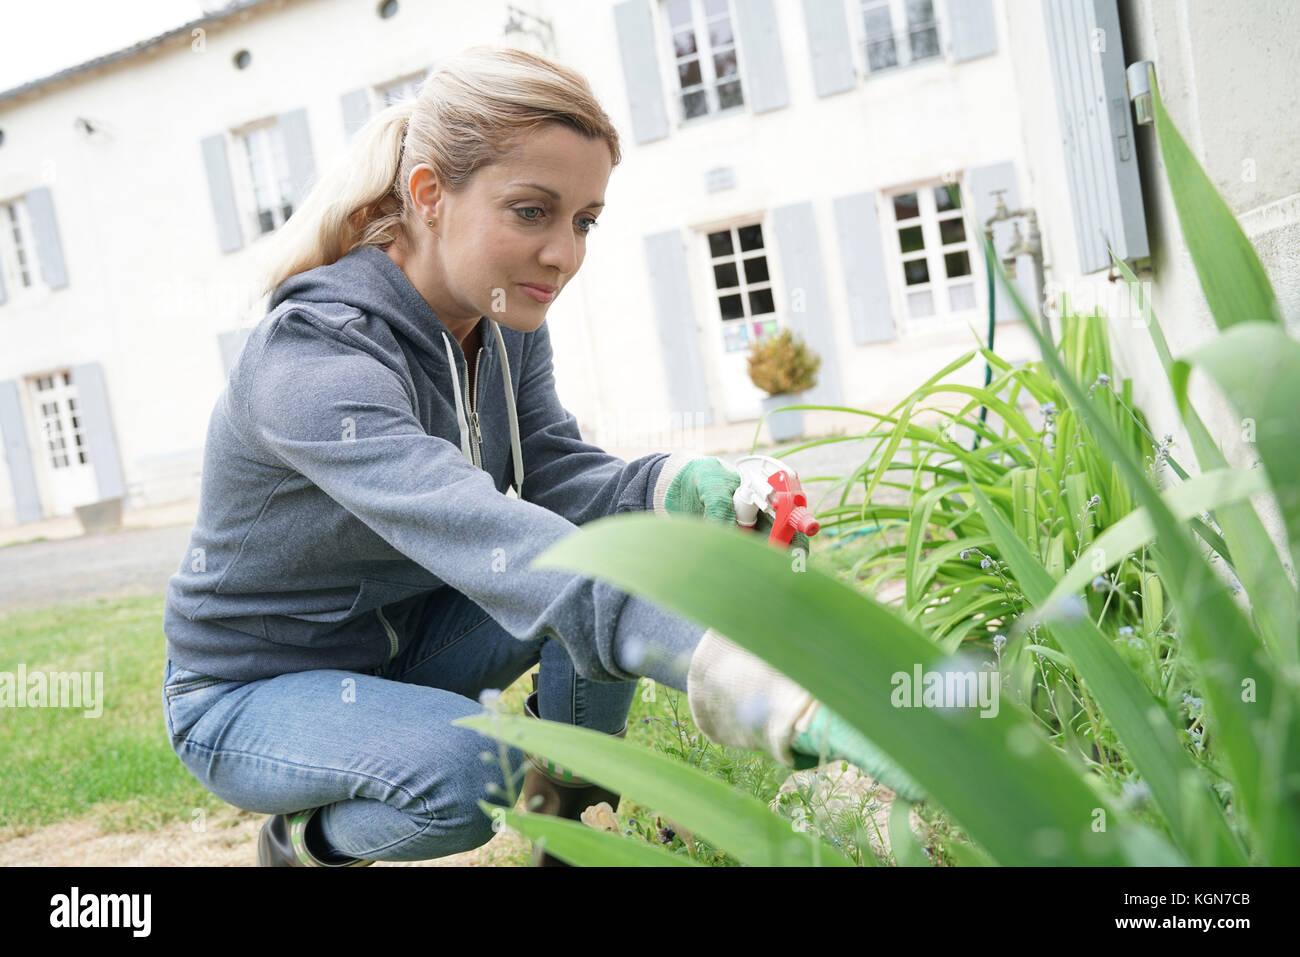 insecticide stockfotos insecticide bilder alamy. Black Bedroom Furniture Sets. Home Design Ideas